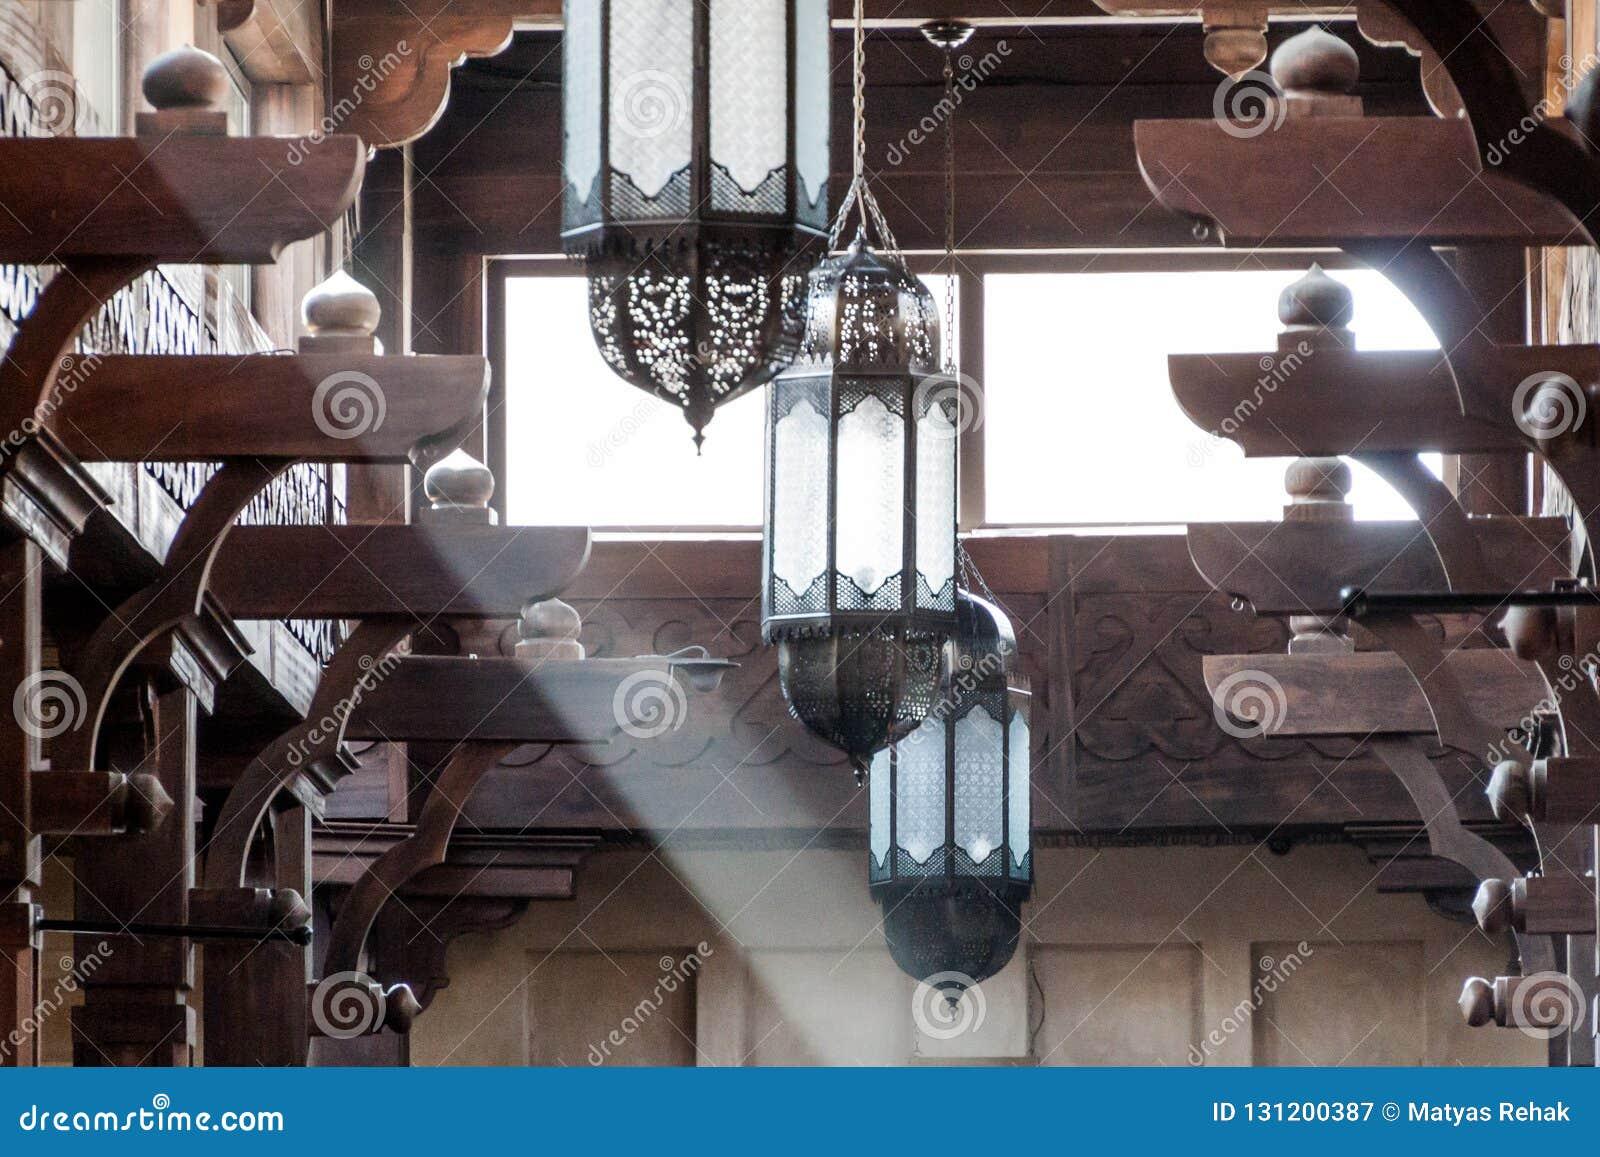 Detail Of A Ceiling Of Madinat Jumeirah Souq In Dubai, United Arab